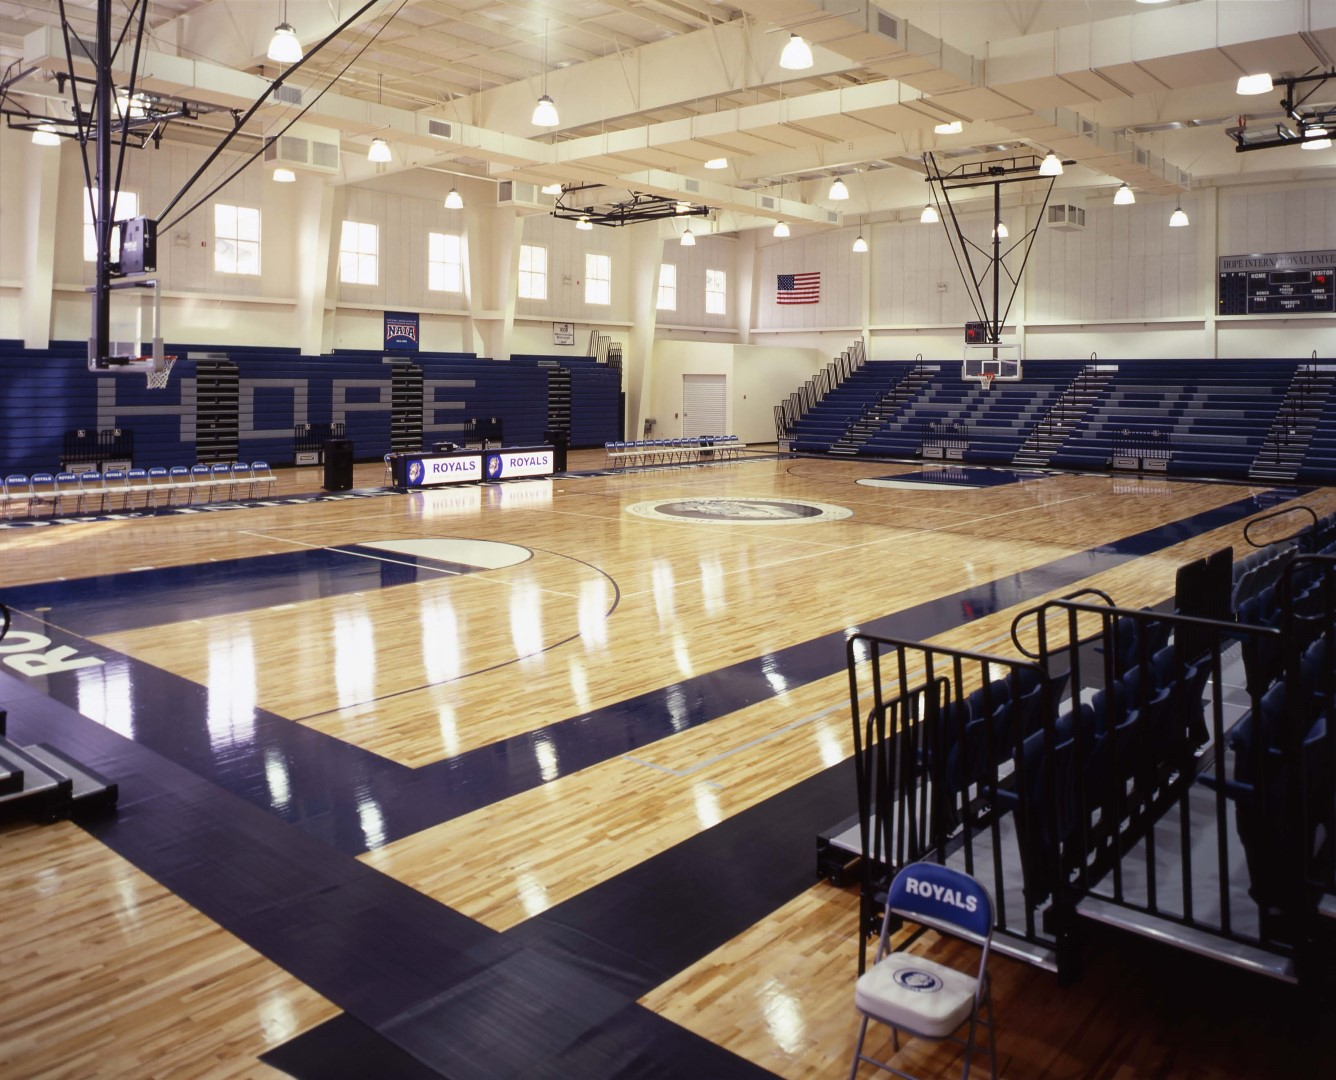 4 Hope International University, Gymnasium_Student Center (Lobby), Fullerton, CA